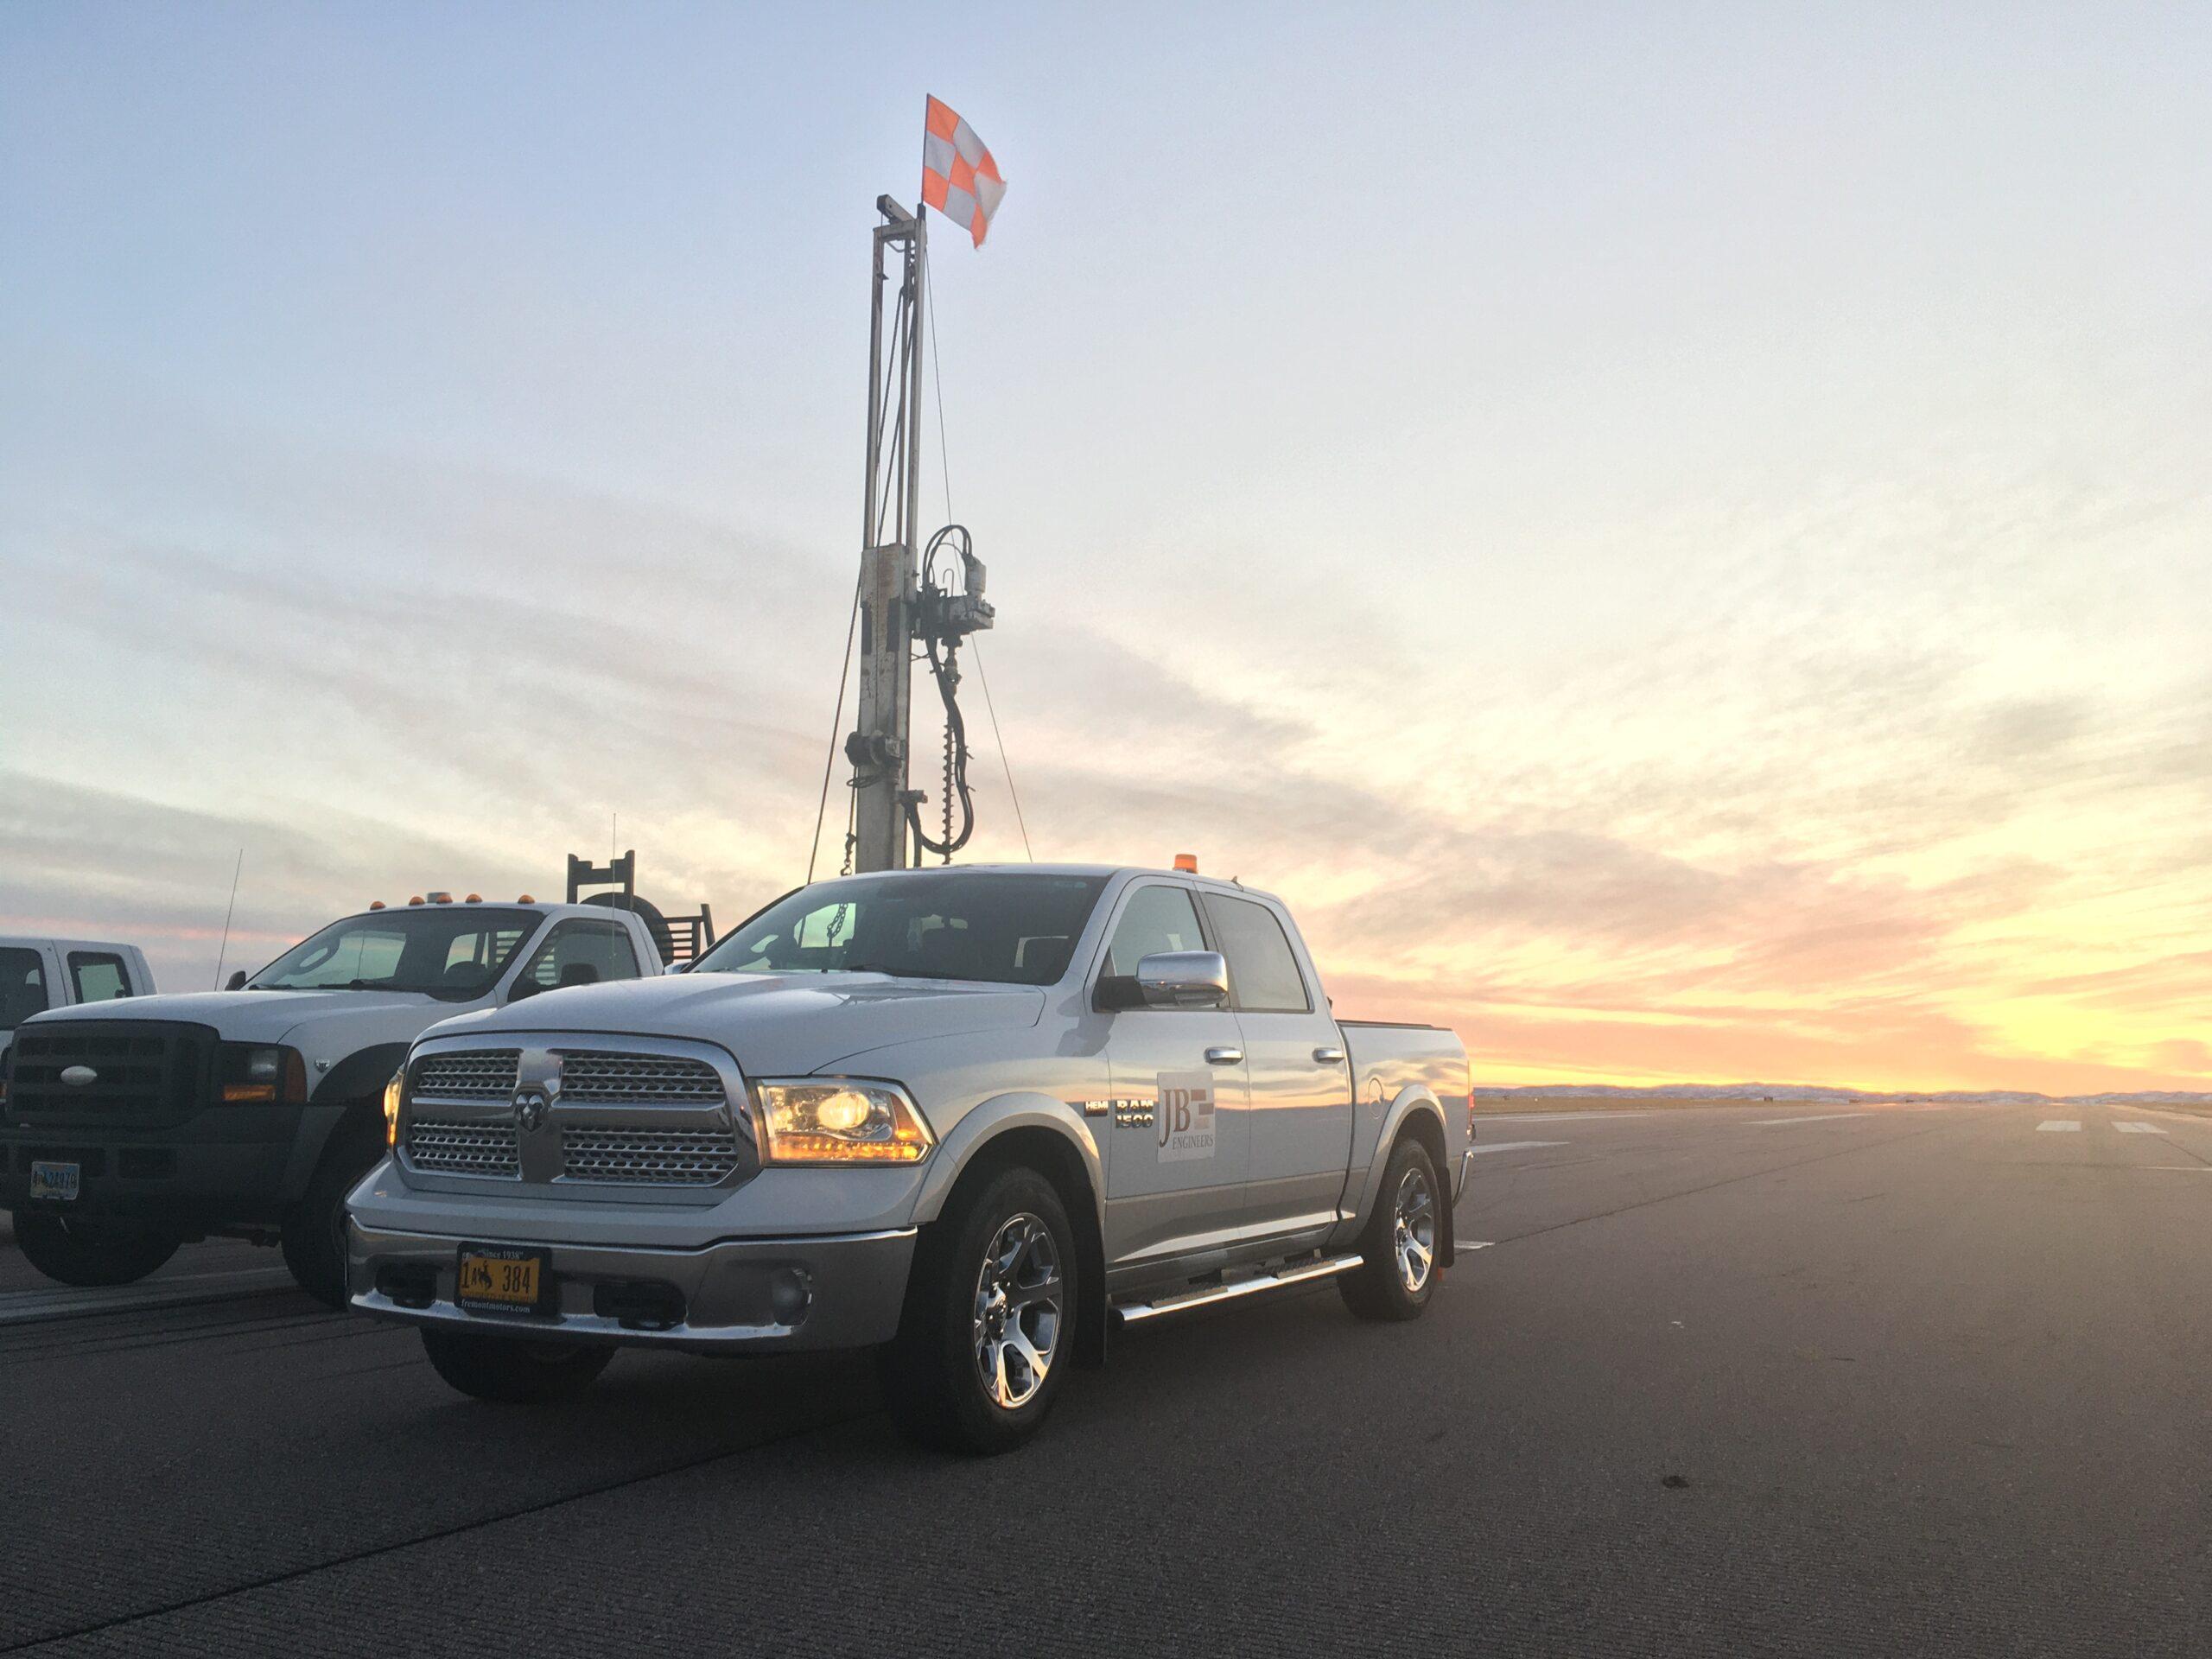 JB Engineers fleet of White Dodge Ram work trucks